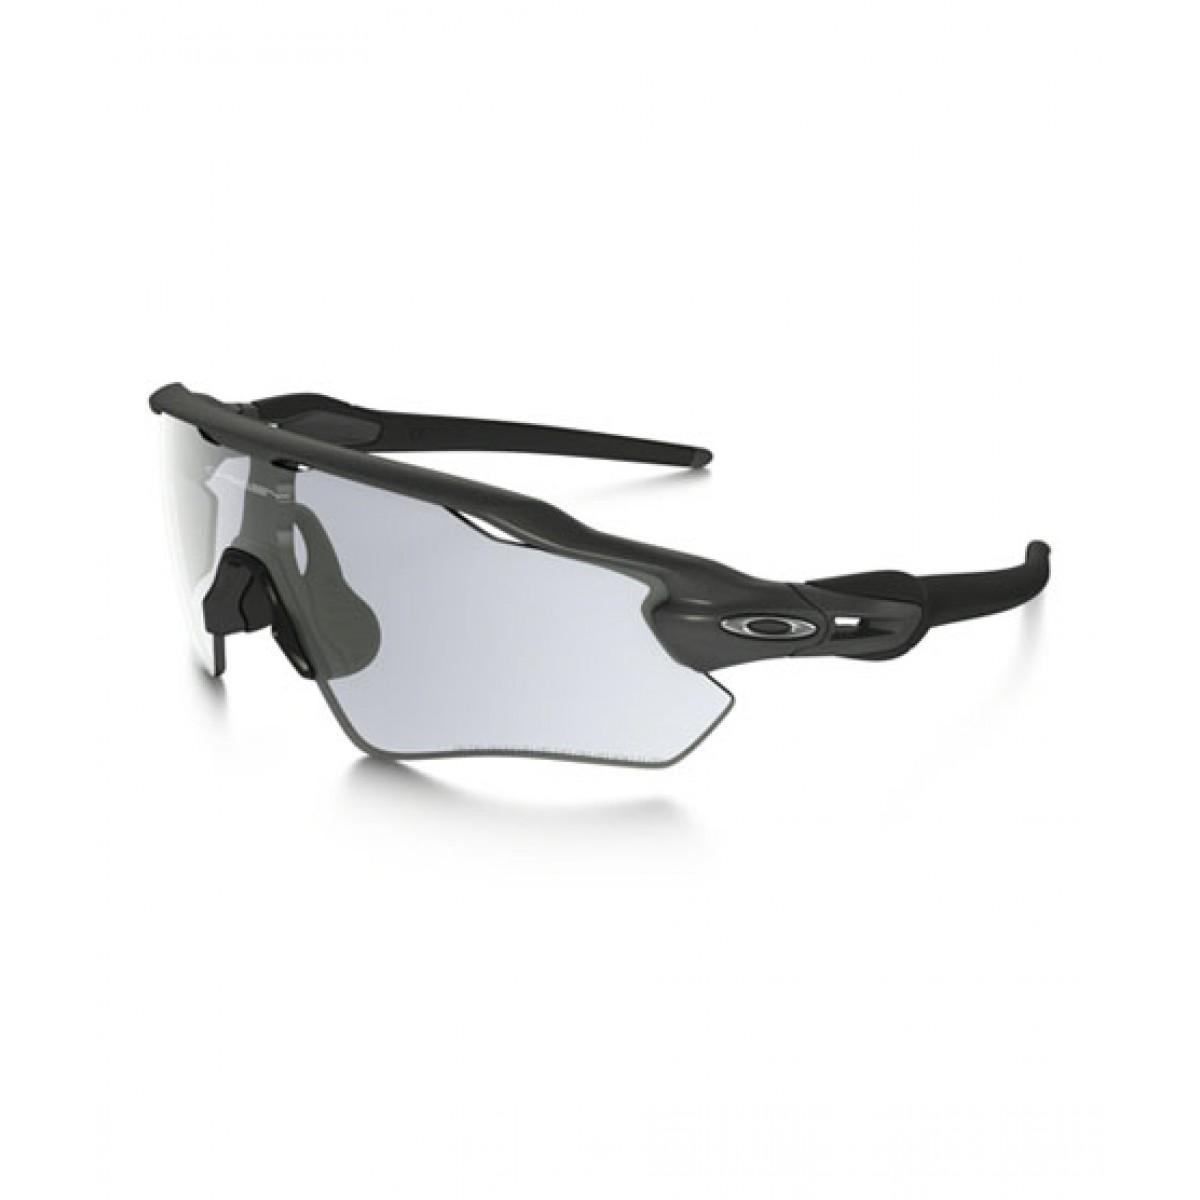 6df2fc93561 Oakley Photochromic Men s Sunglasses Price in Pakistan